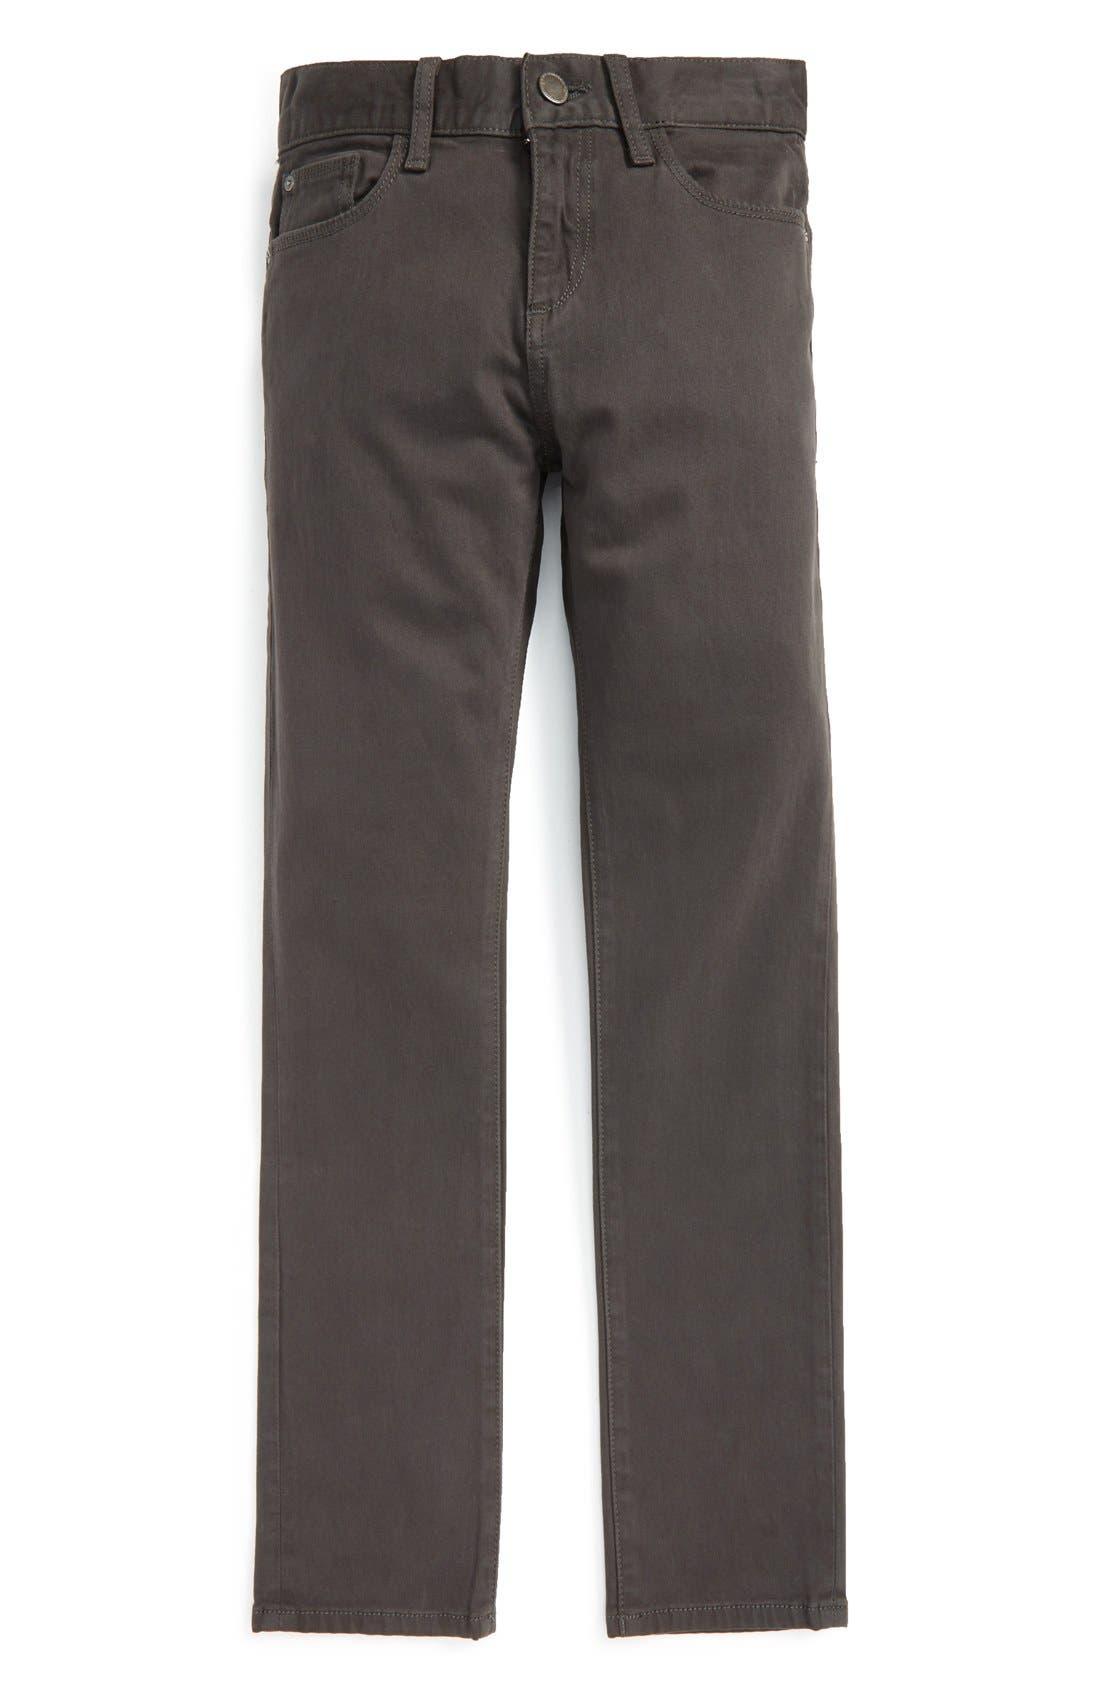 Alternate Image 1 Selected - DL1961 'Hawke' Skinny Jeans (Big Boys)